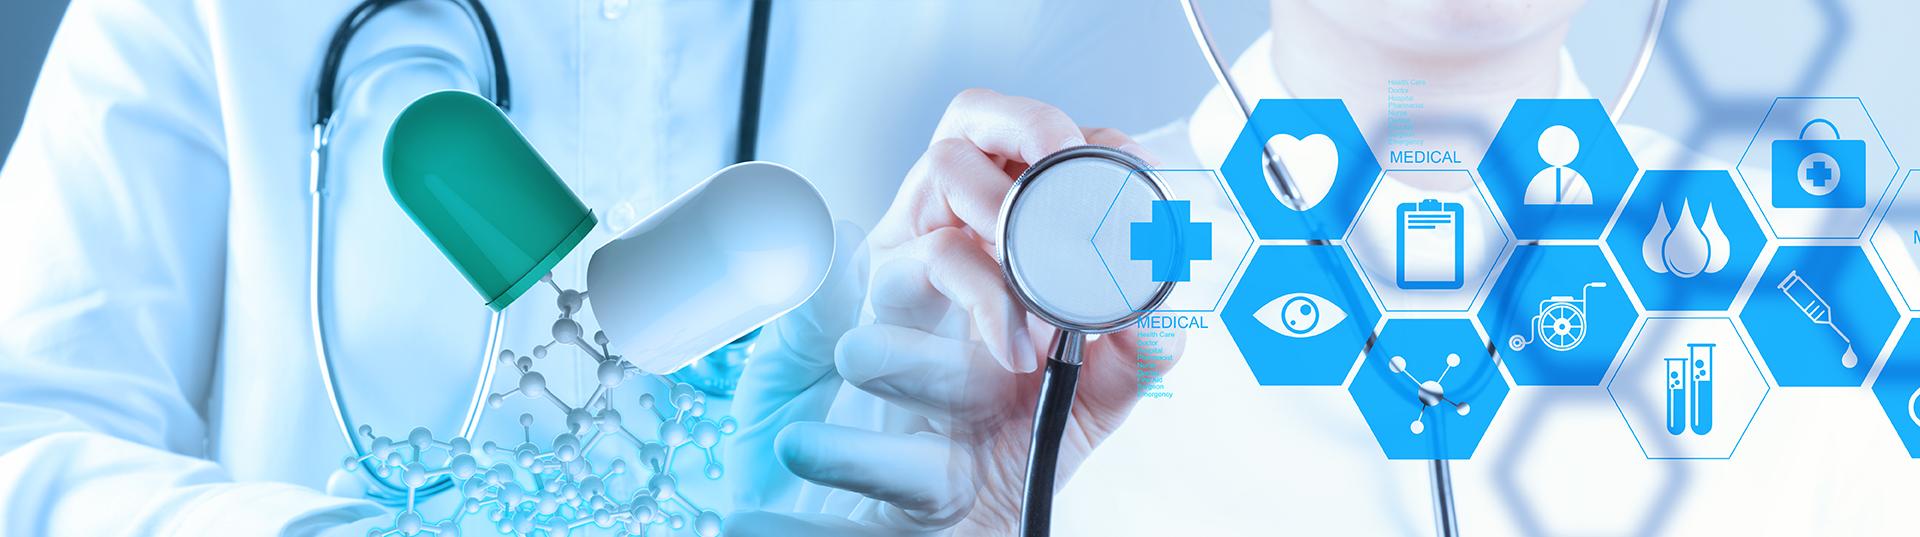 Advera Health Analytics, Inc.